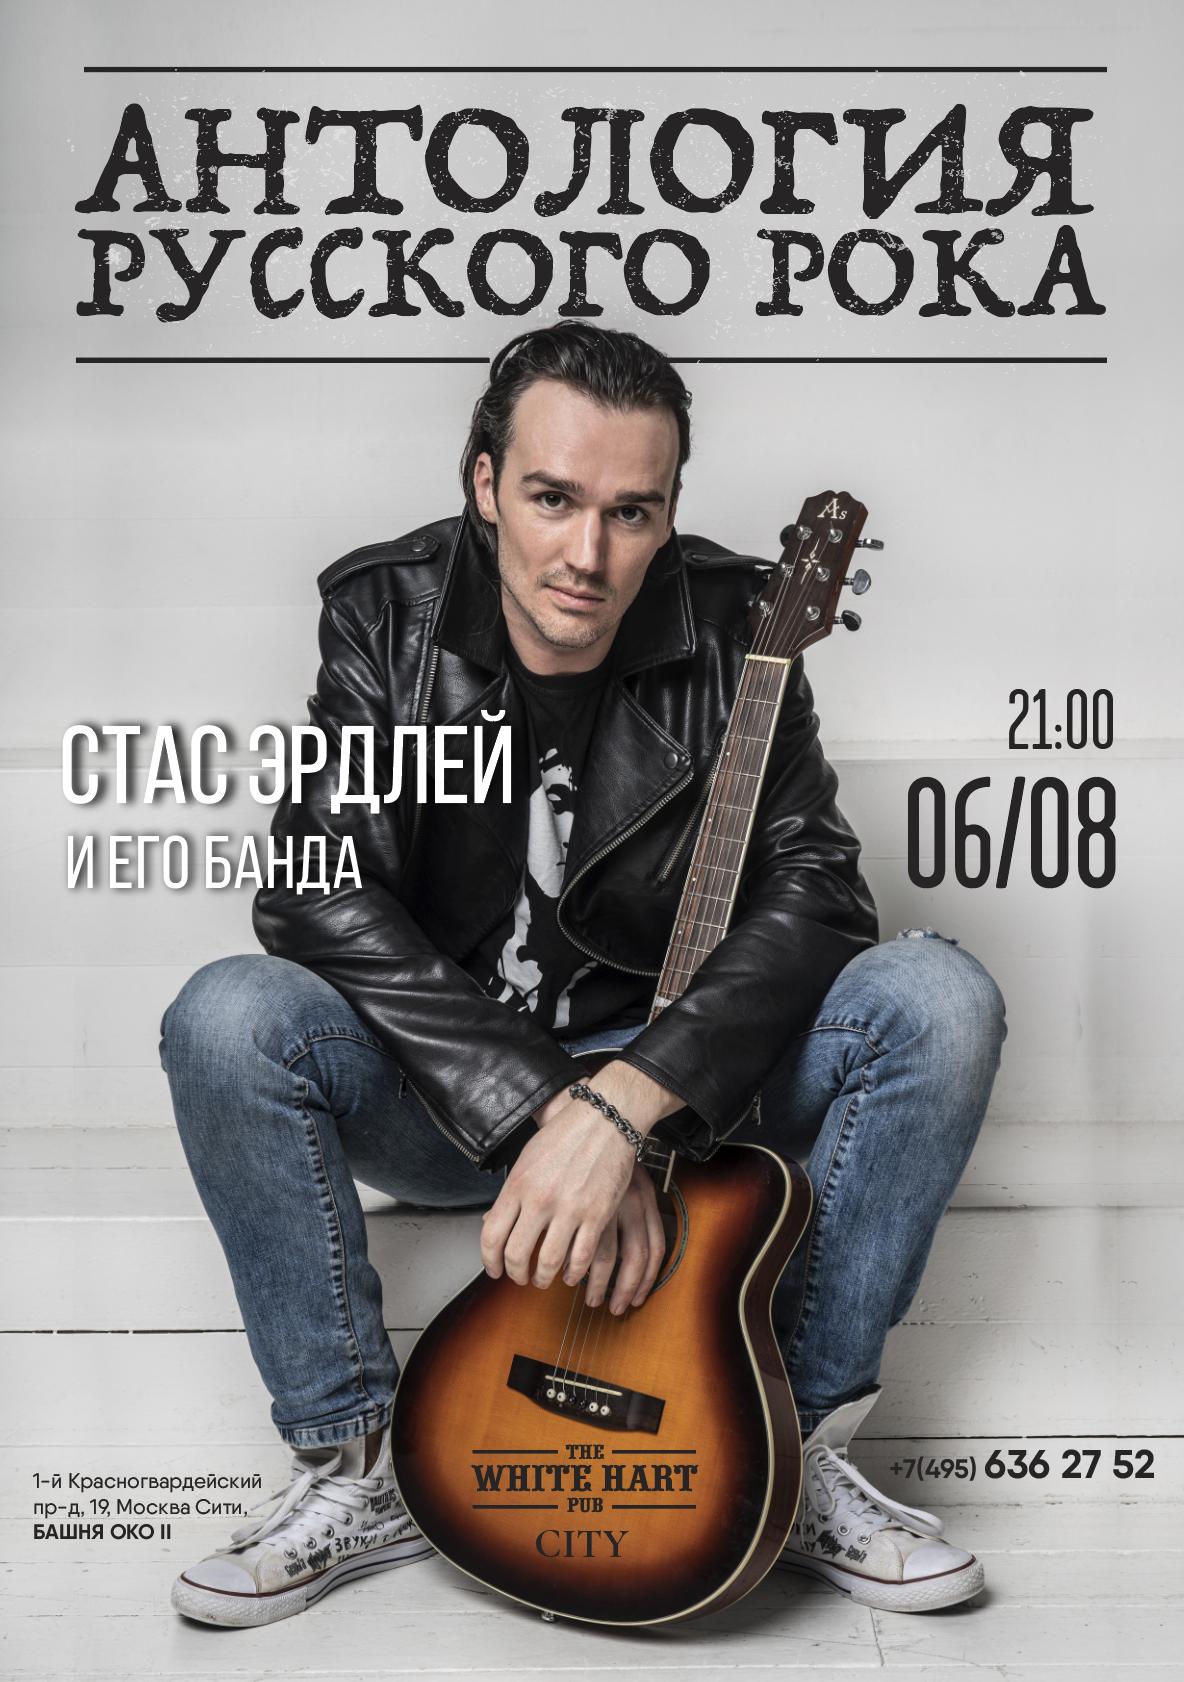 Афиша! 06 августа — Стас Эрдлей  в White Hart Pub Moscow City